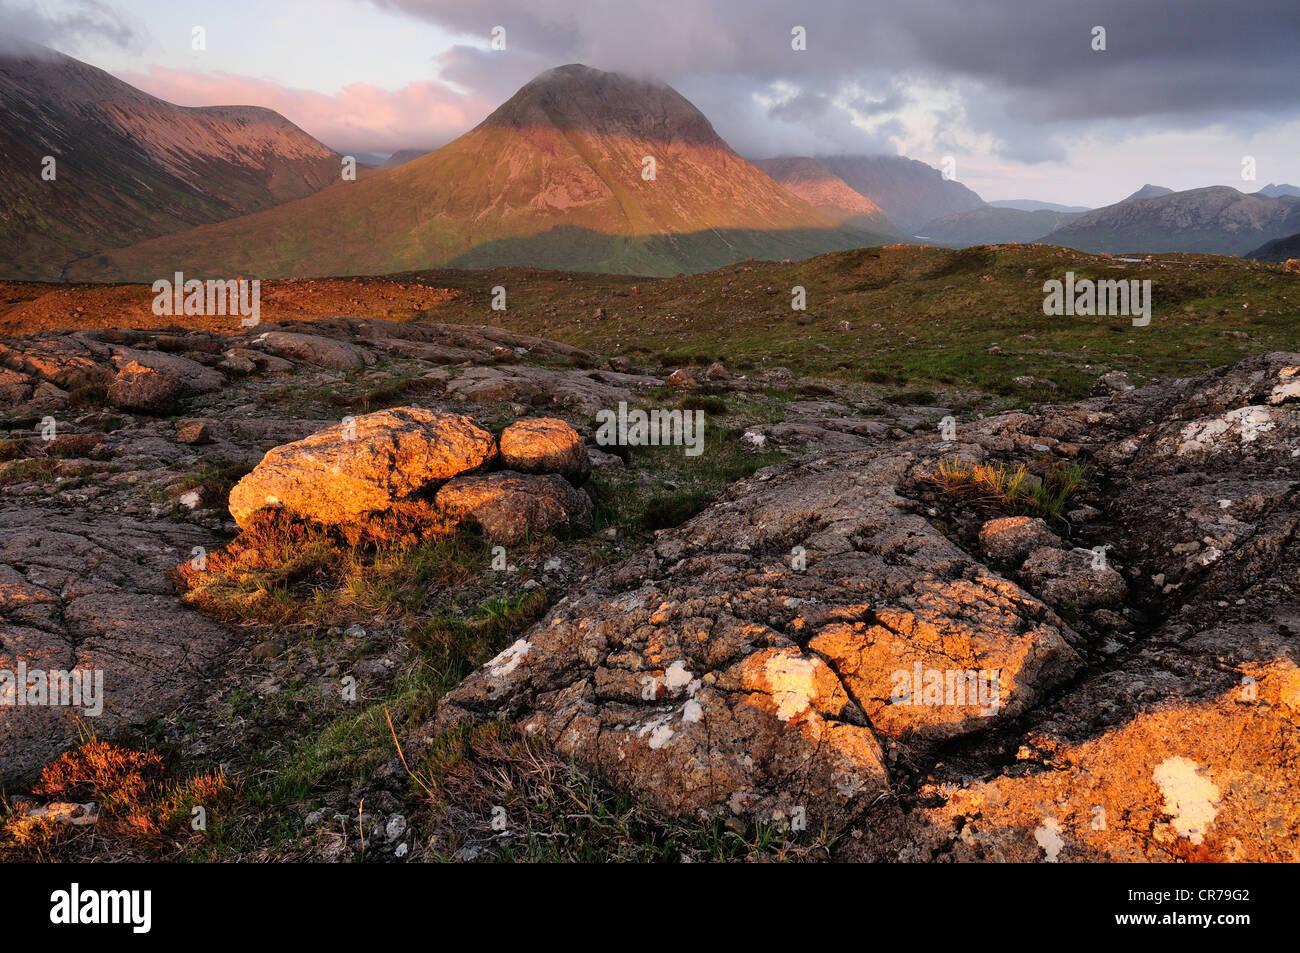 Summer evening sunlight on rocks on Nead na h - lolaire and Marsco, Isle of Skye, Scotland - Stock Image